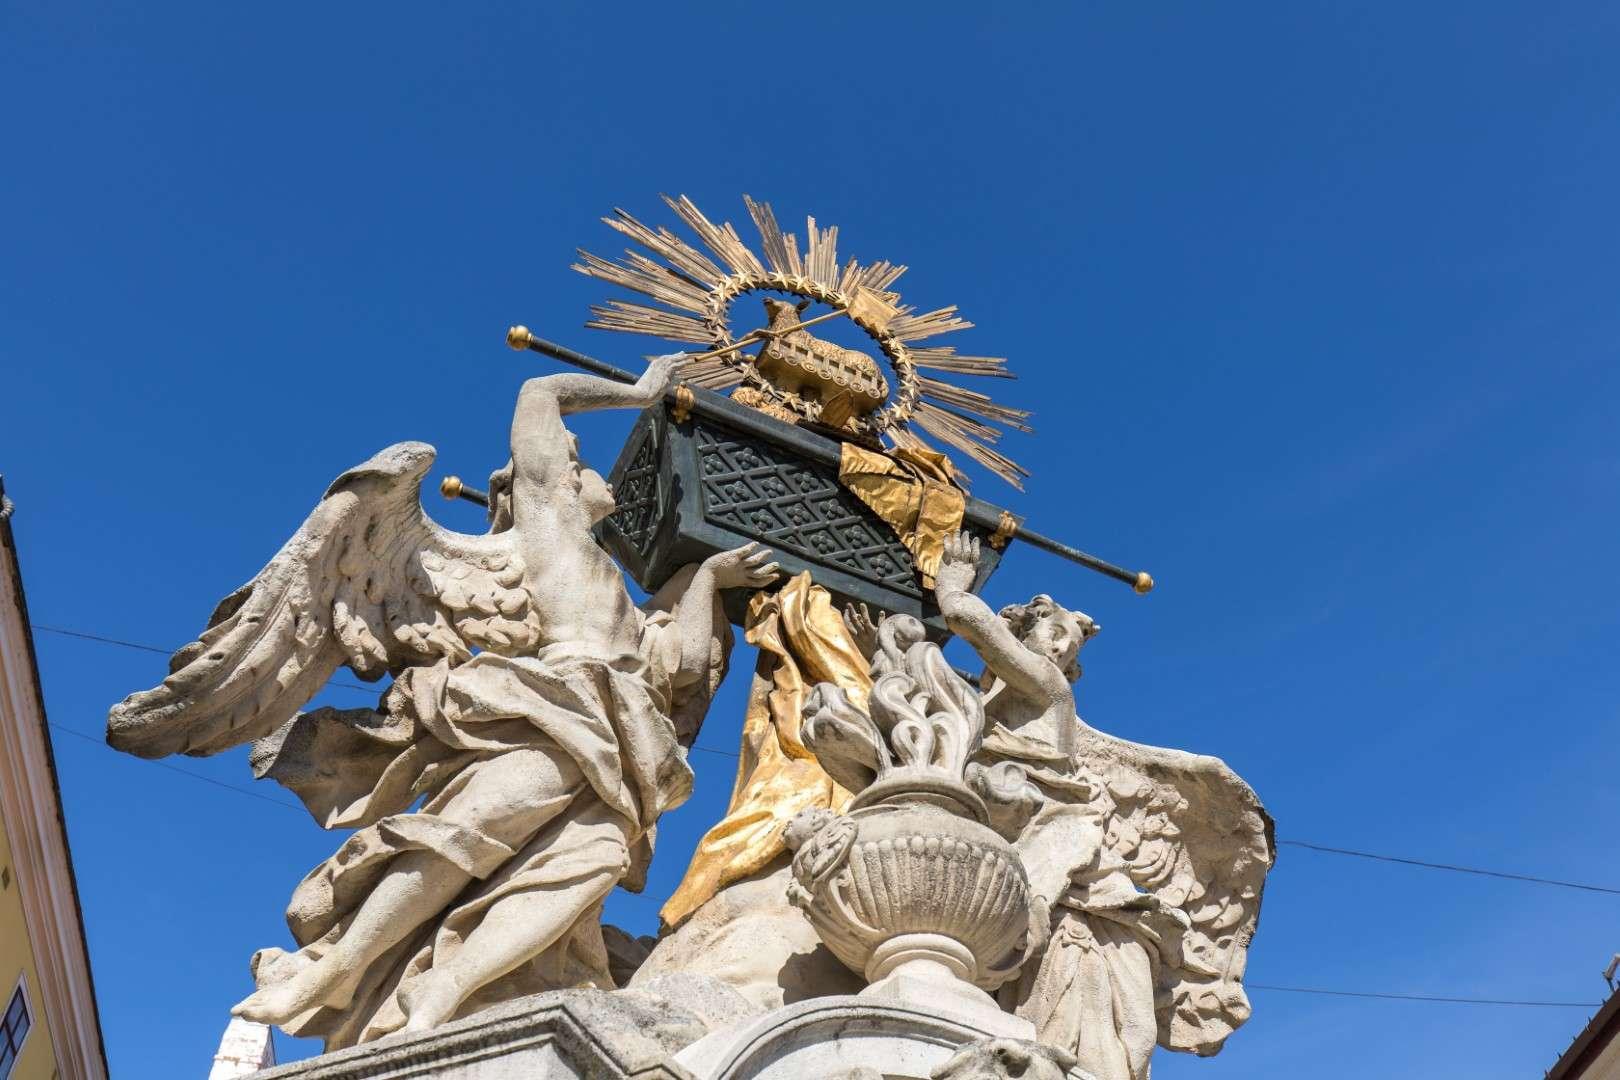 <a href='http://hellogyor.hu/en/sights/the-ark-of-the-covenant/'>The Ark of the Covenant</a>